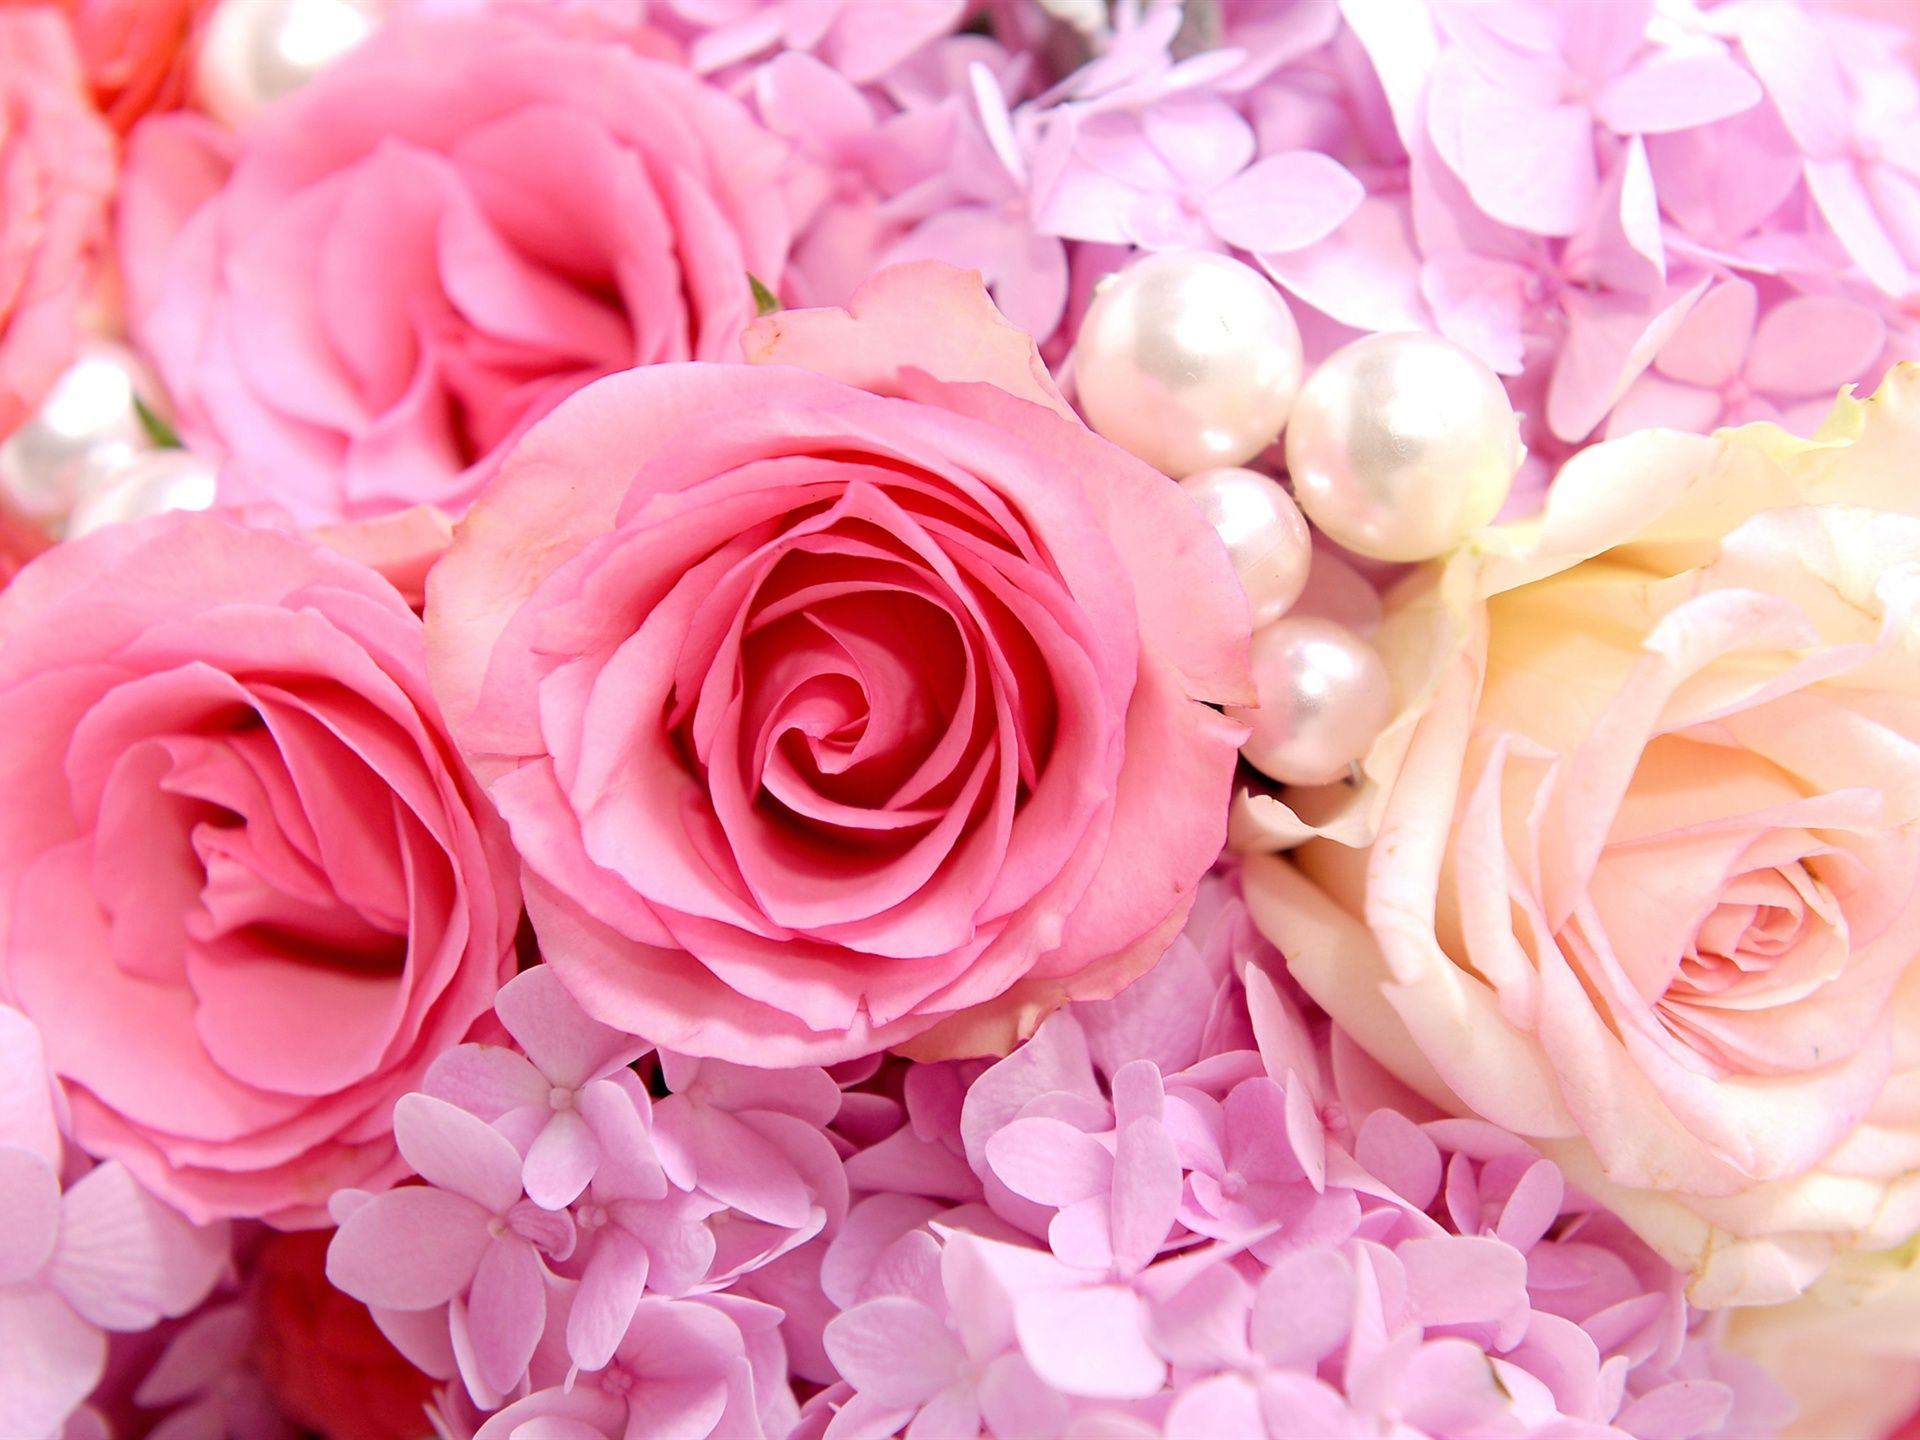 Google theme rose - Tumblr Themes Vintage Floral Buscar Con Google